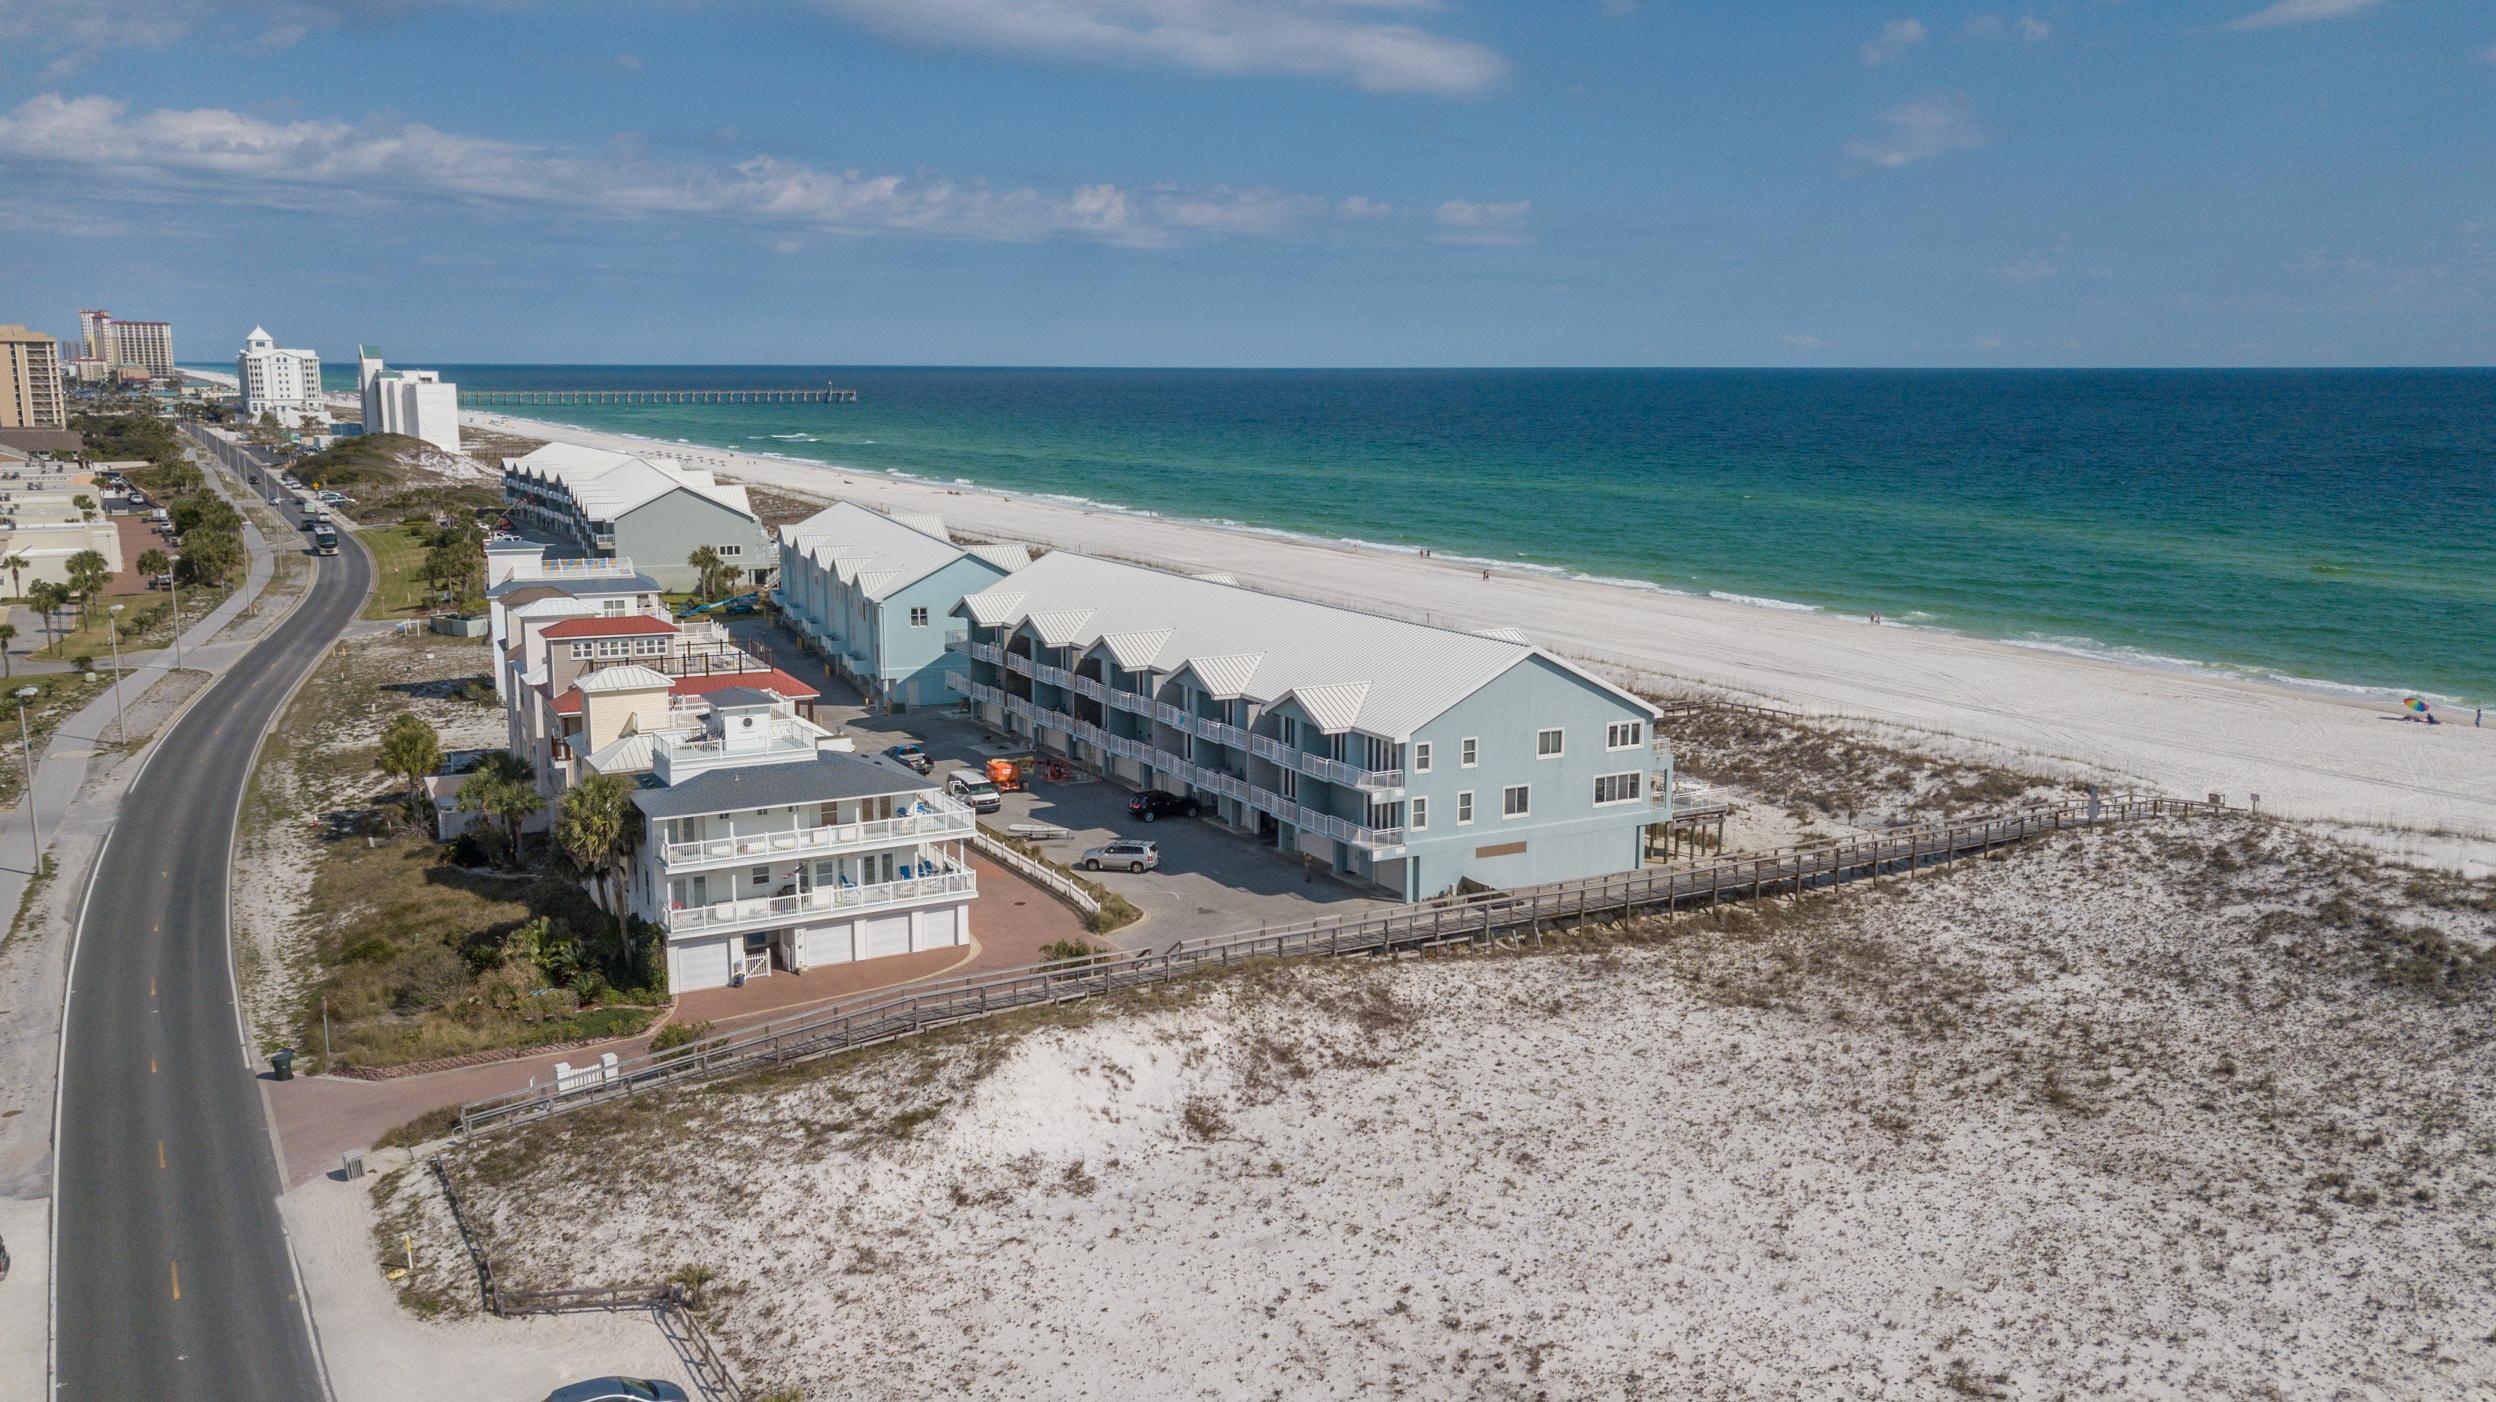 White Sands Cottage 501 Life's a Beach House Townhouse rental in White Sands Pensacola Beach in Pensacola Beach Florida - #63